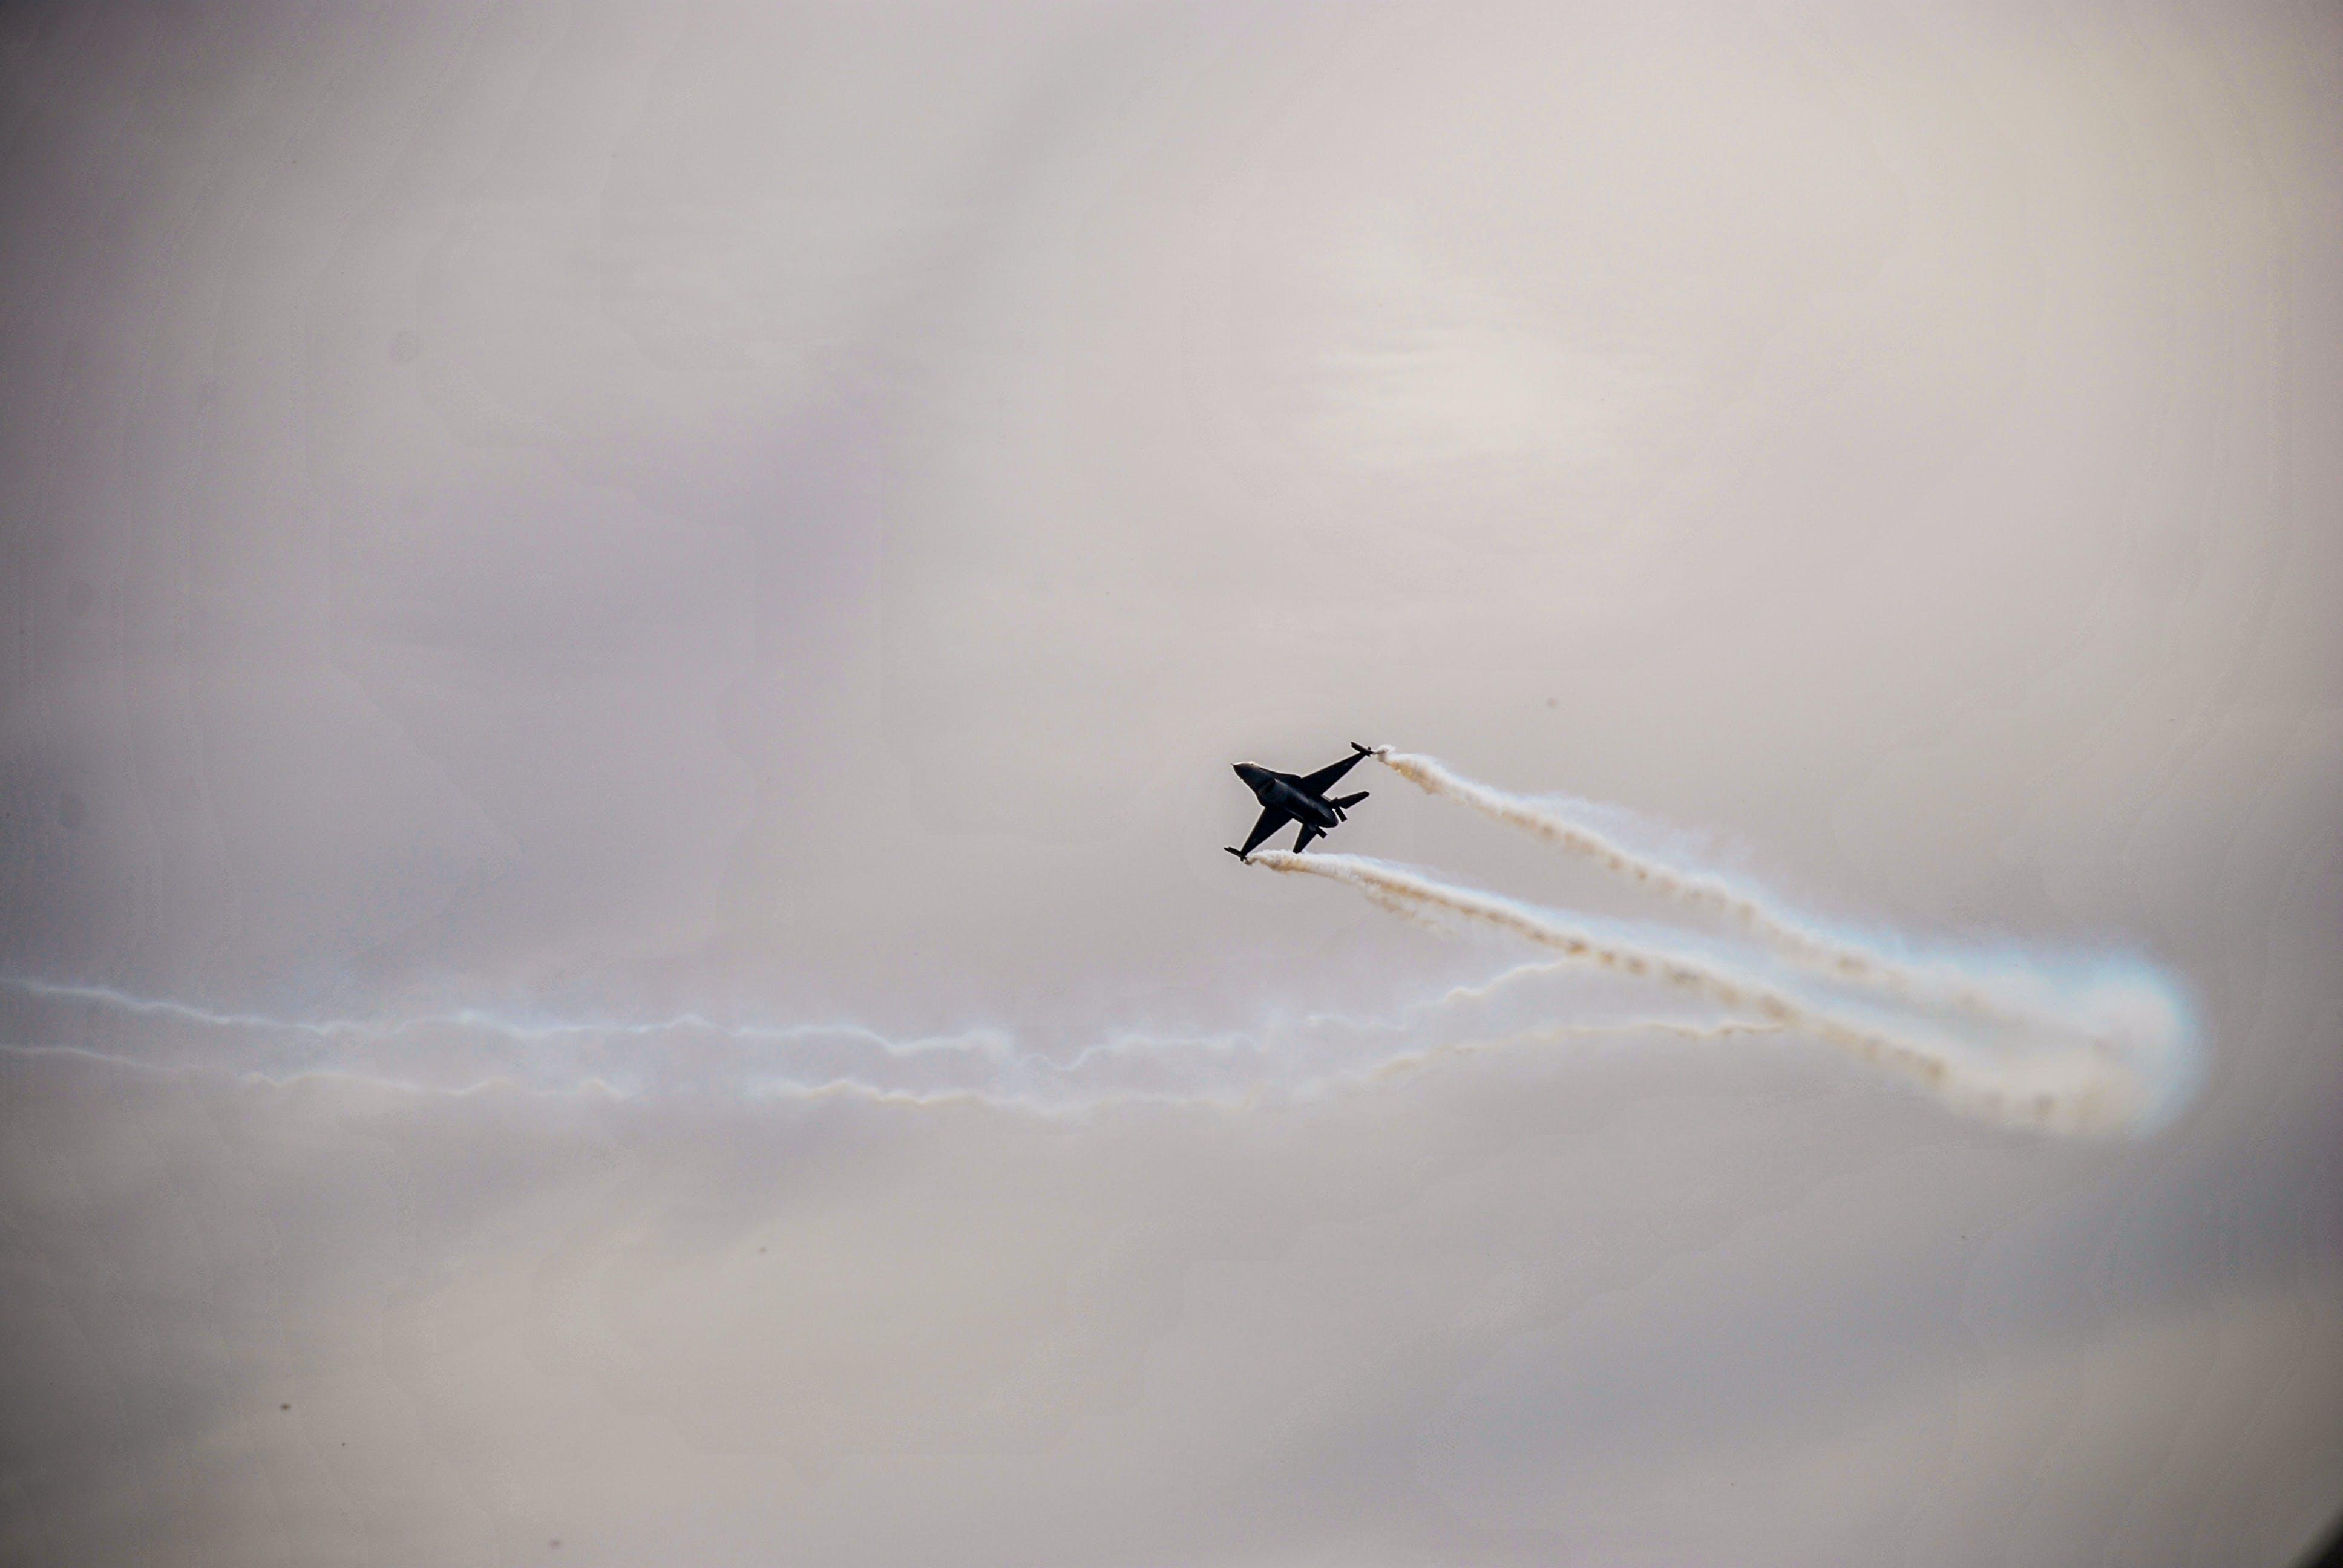 Black Jetpane on Air